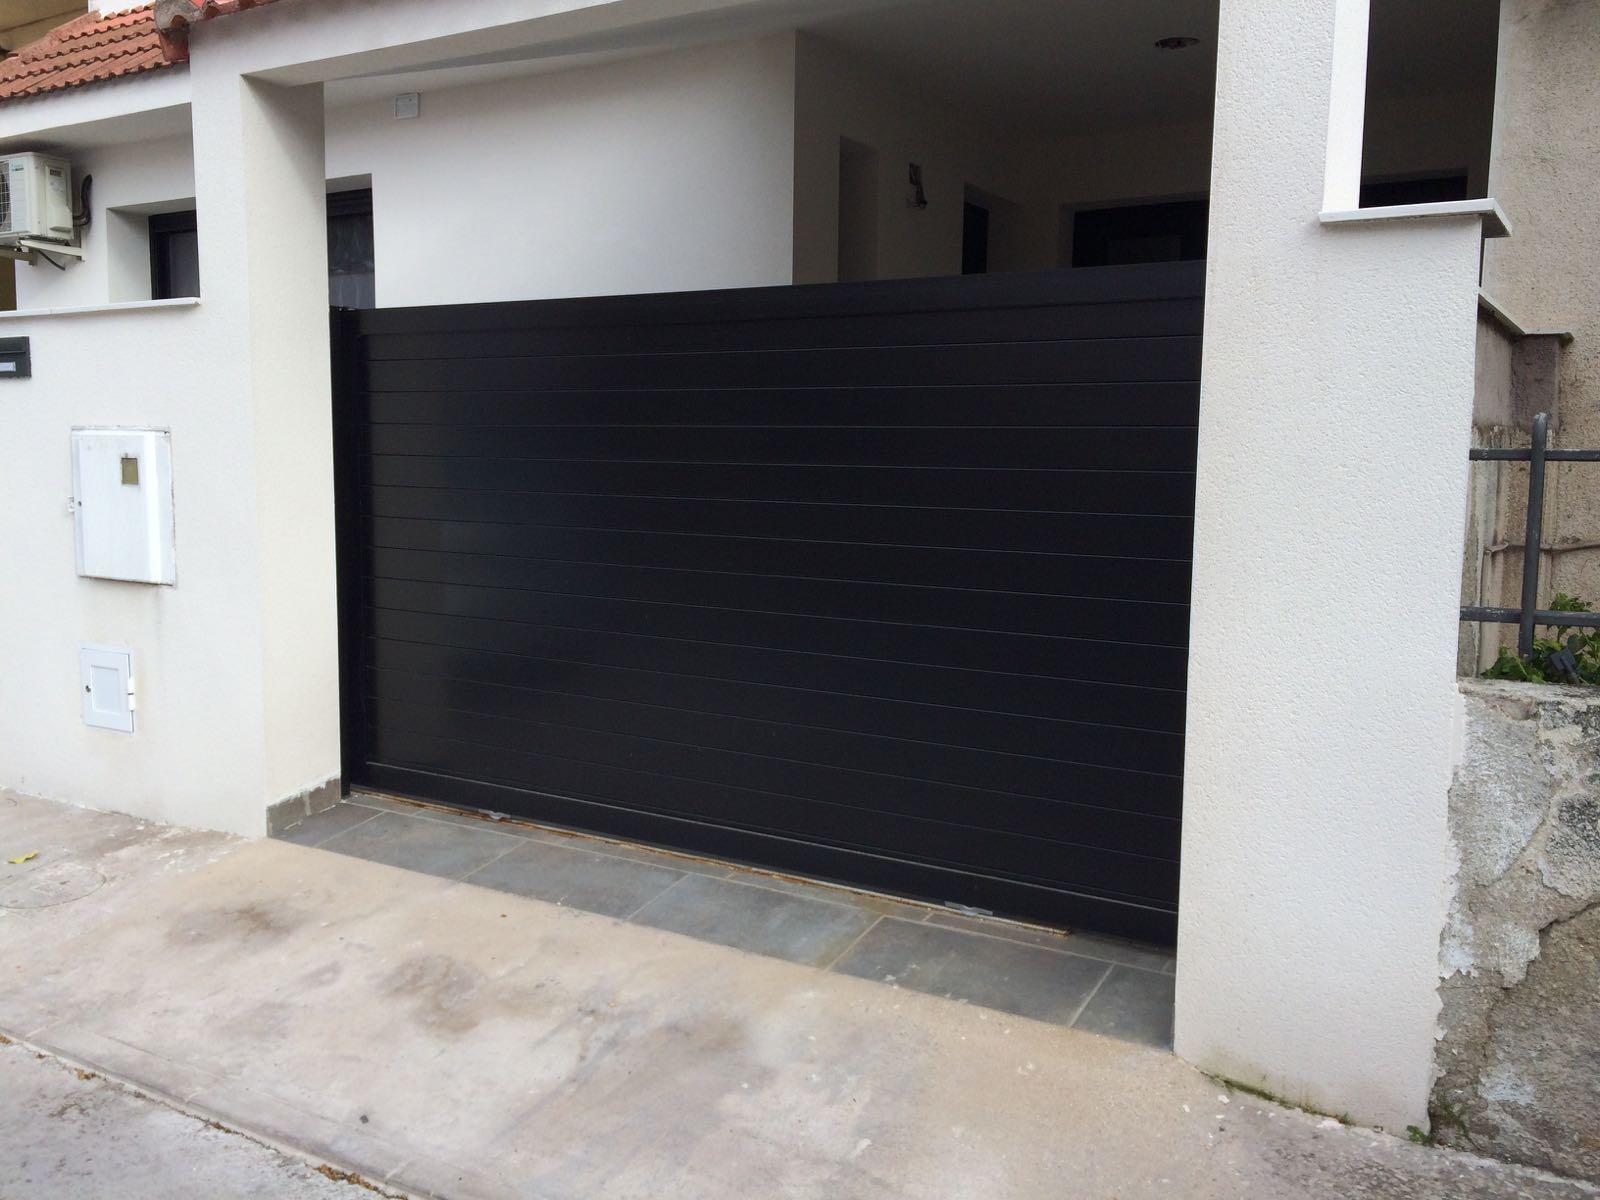 Puertas de aluminio para exterior de marver aluminio for Correderas de aluminio precios